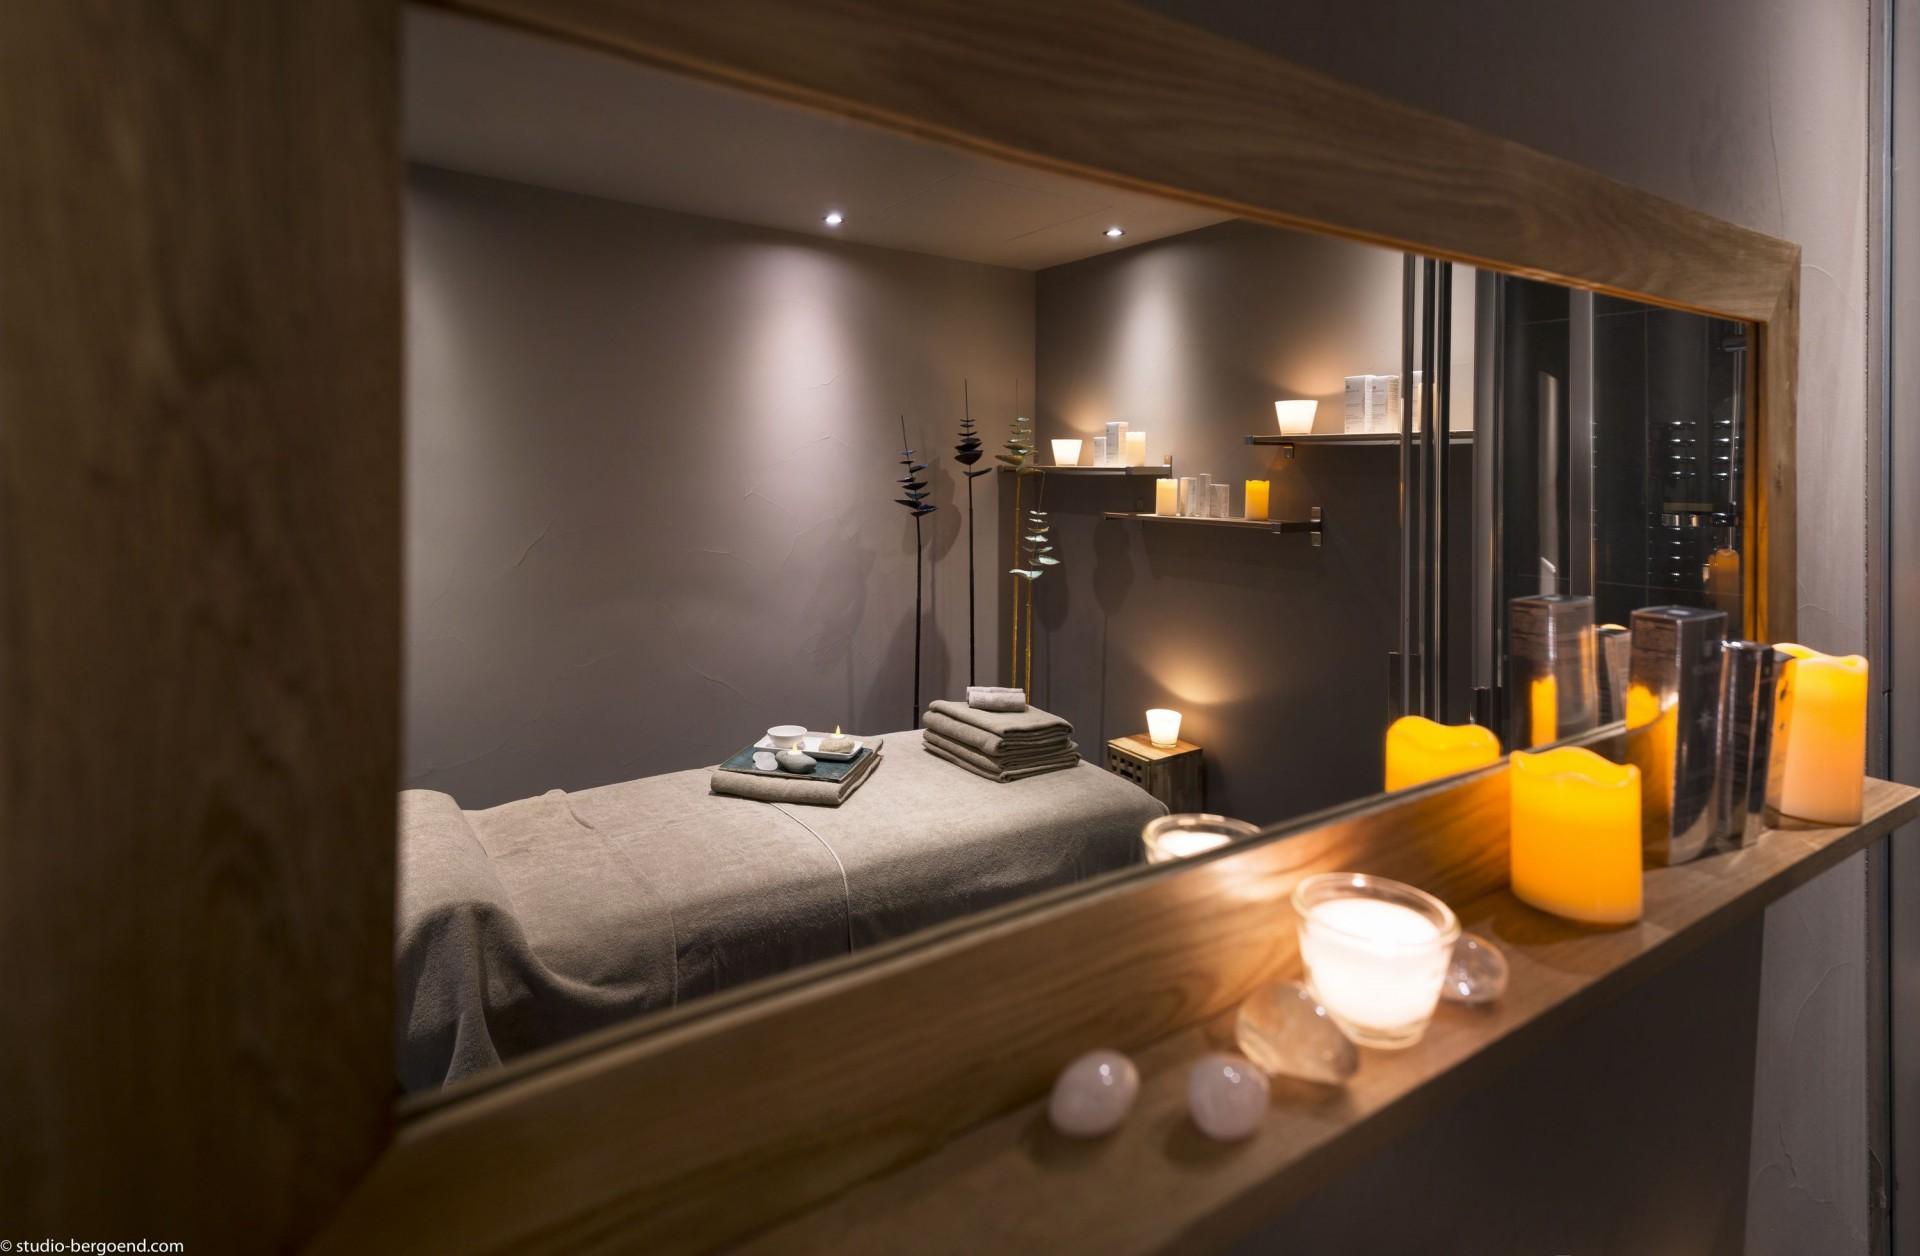 Tignes Location Appartement Luxe Kyonite Massage